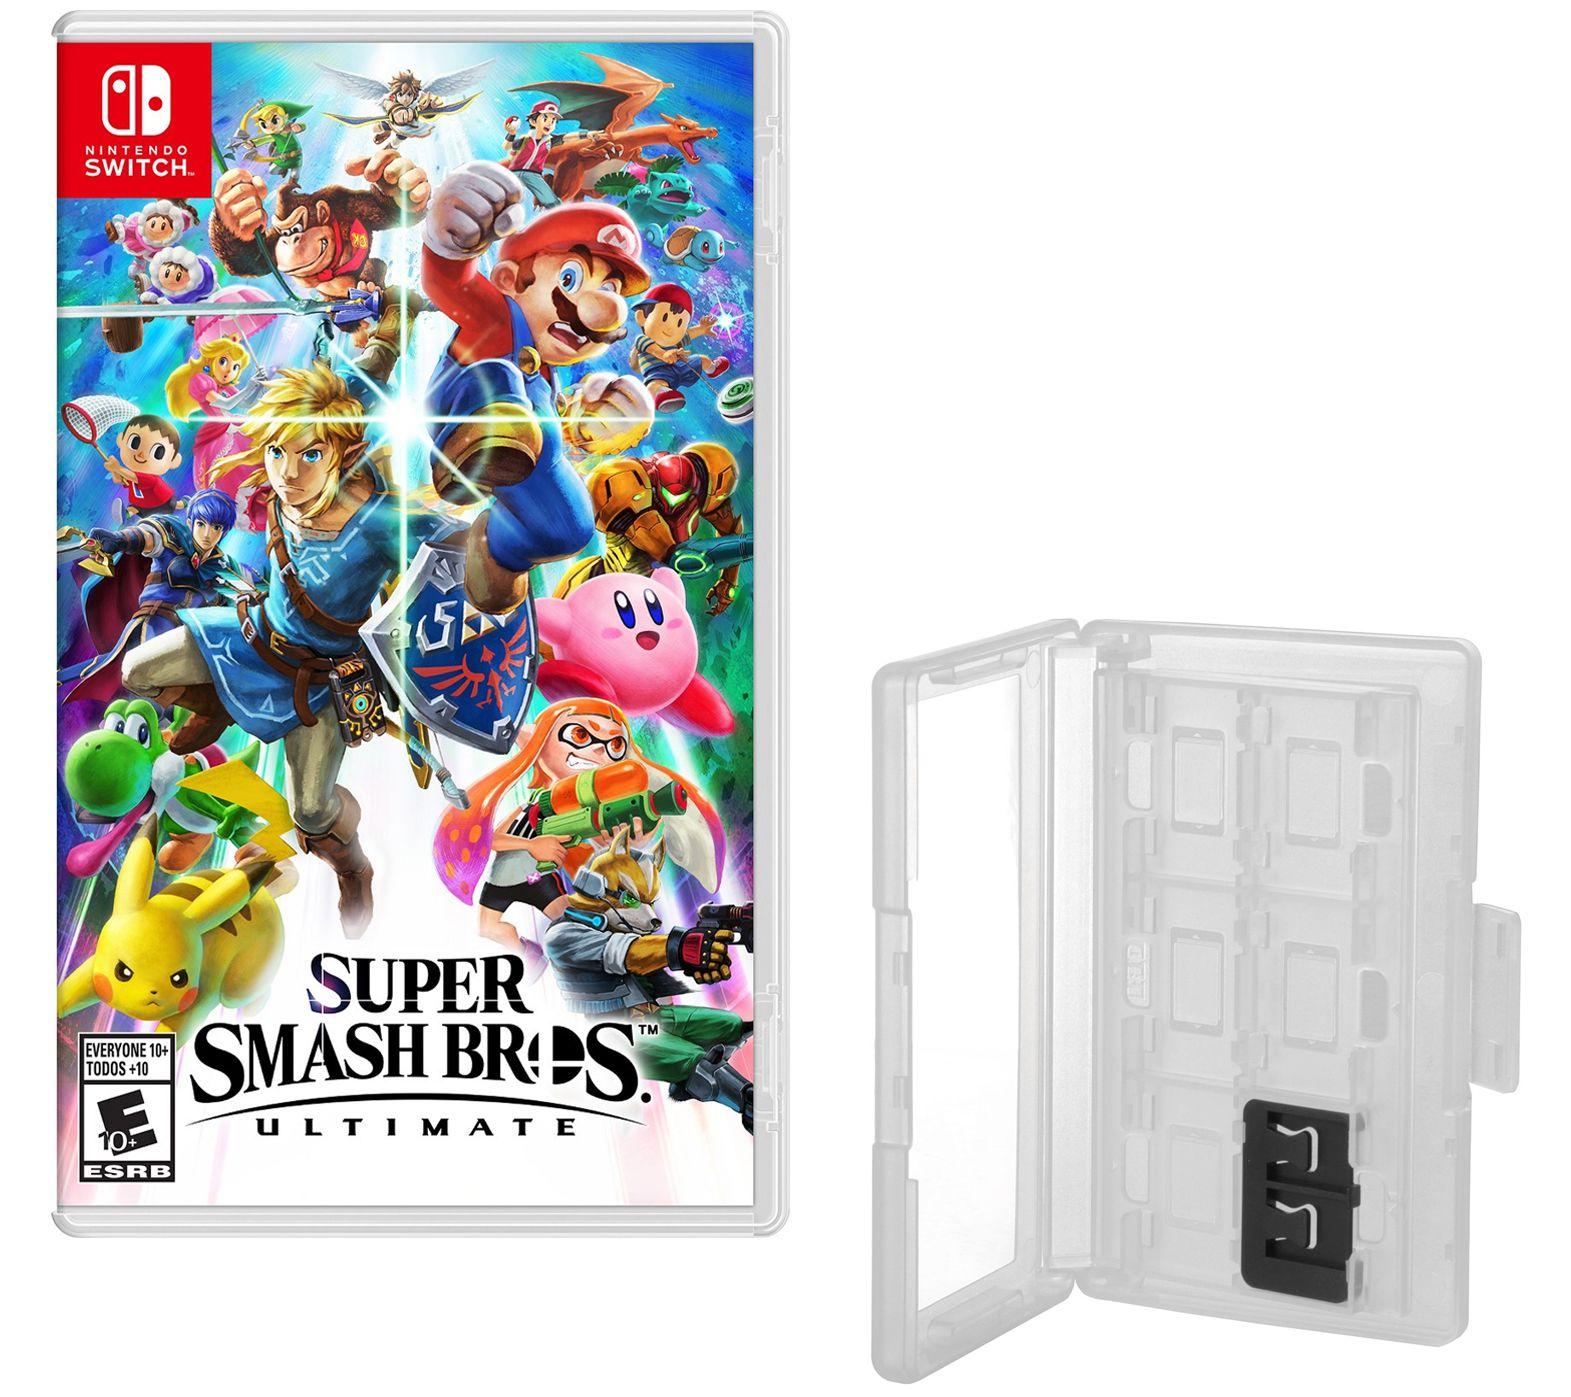 Super Smash Bros Ultimate Nintendo Switch Gameand Game Caddy — QVC com